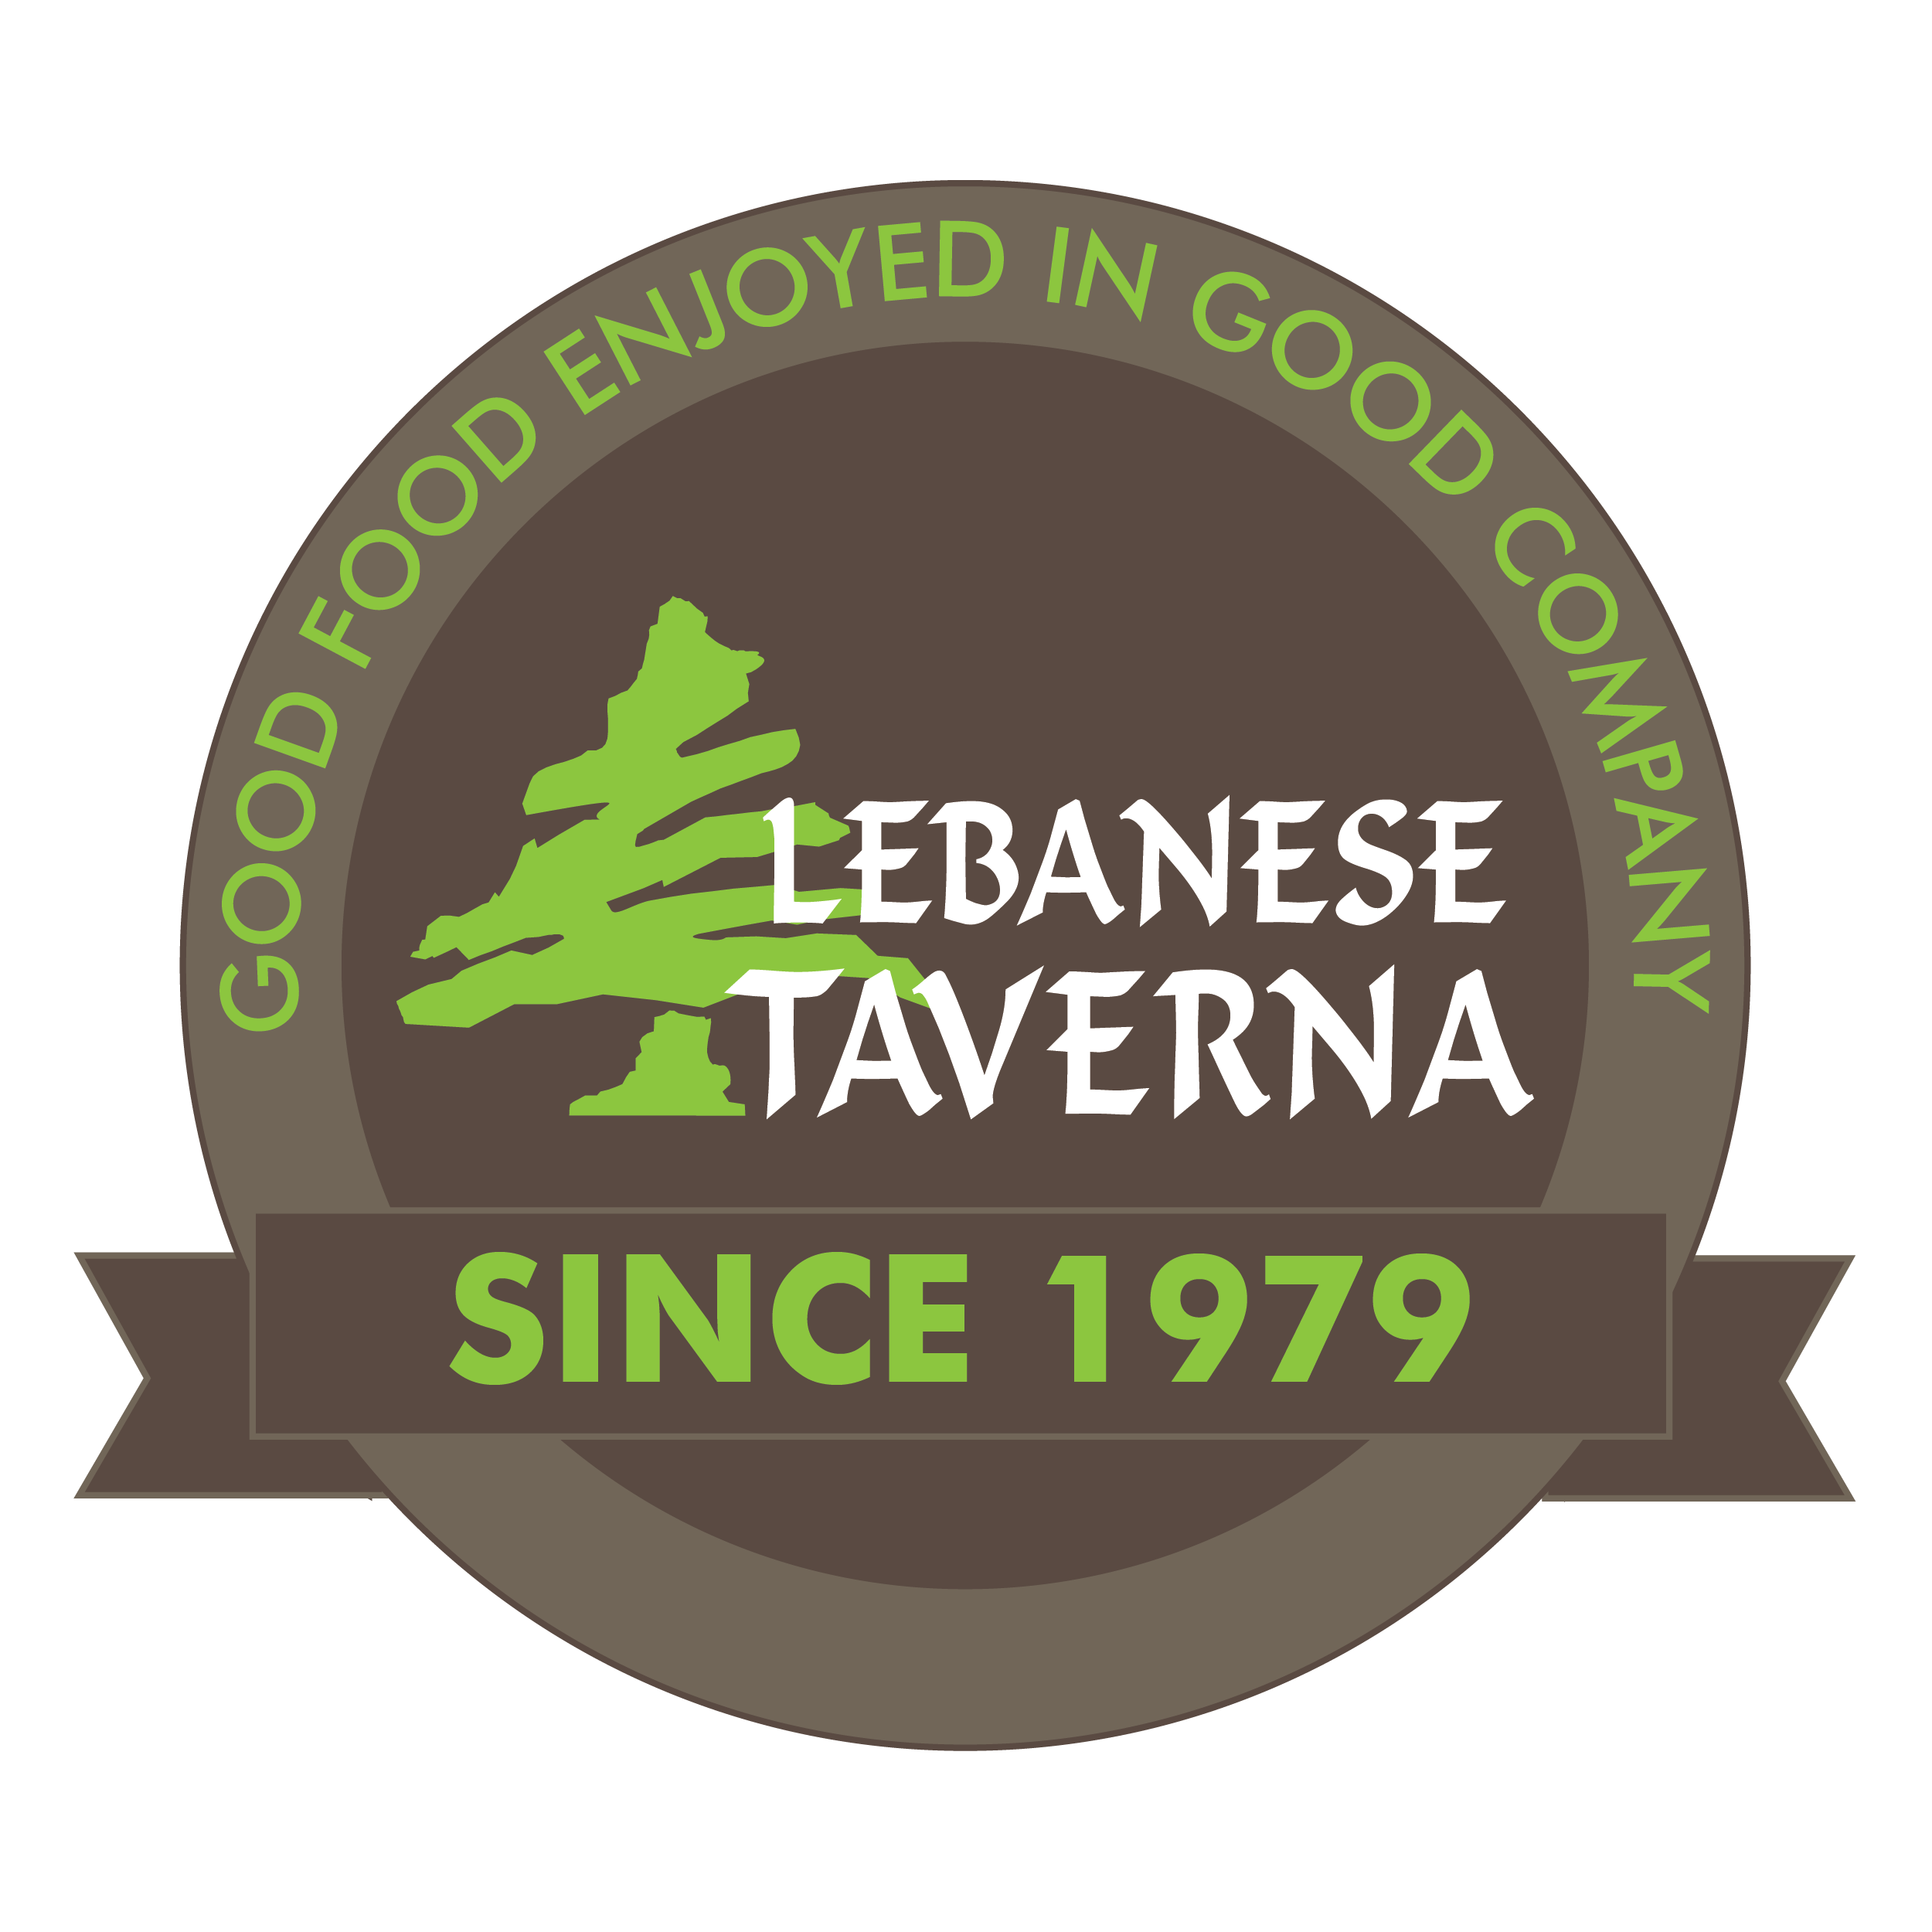 Lebanese Taverna_AnniversaryLogo.png